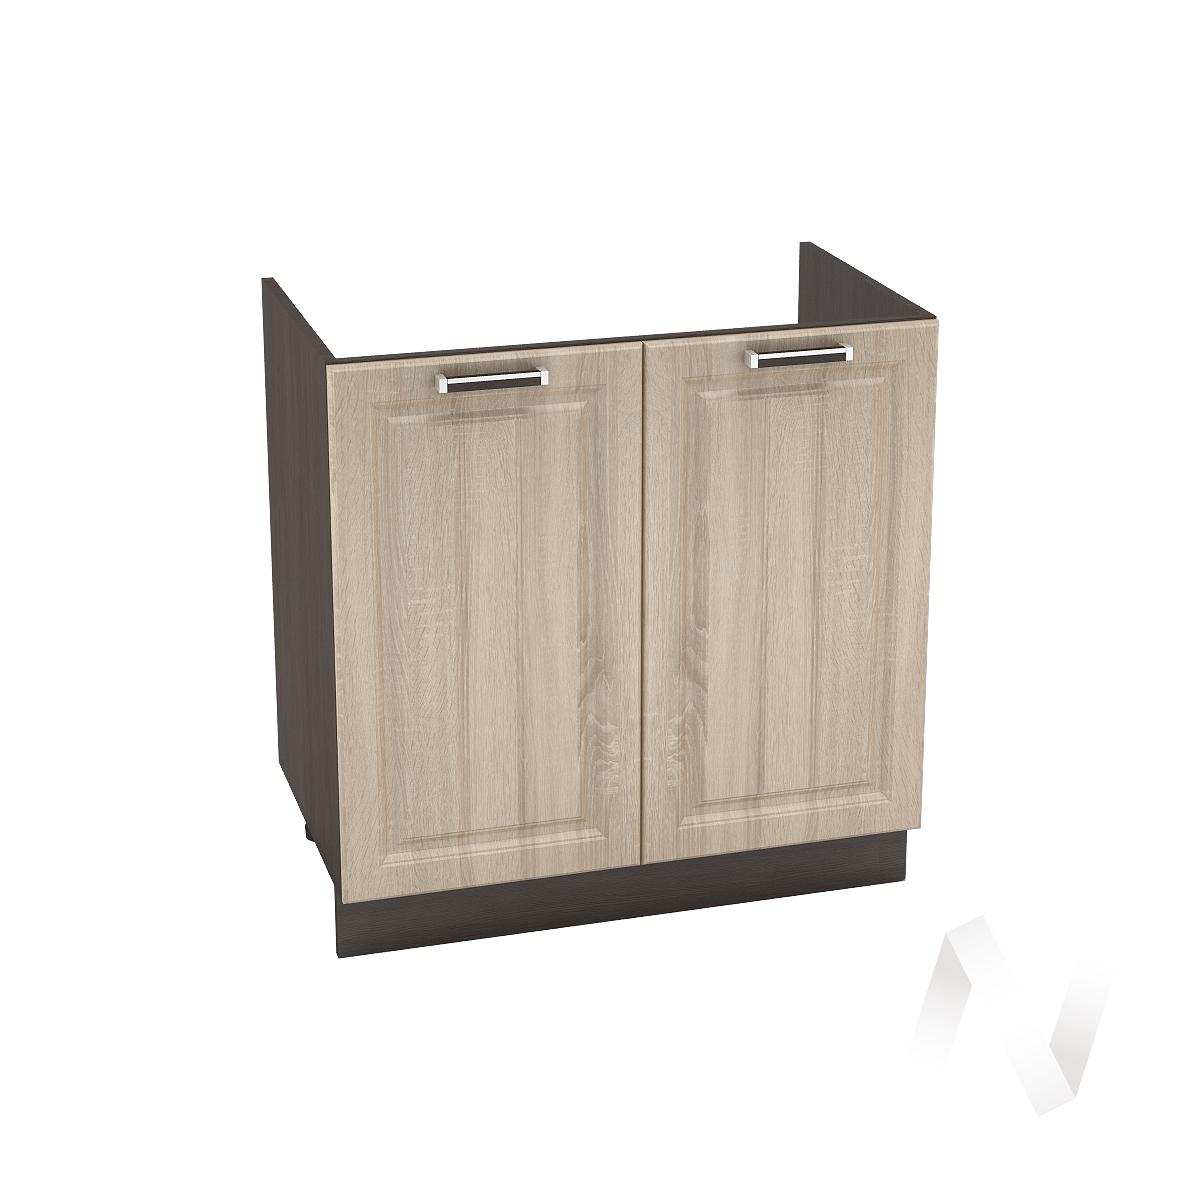 "Кухня ""Прага"": Шкаф нижний под мойку 800, ШНМ 800 (дуб сонома/корпус венге)"